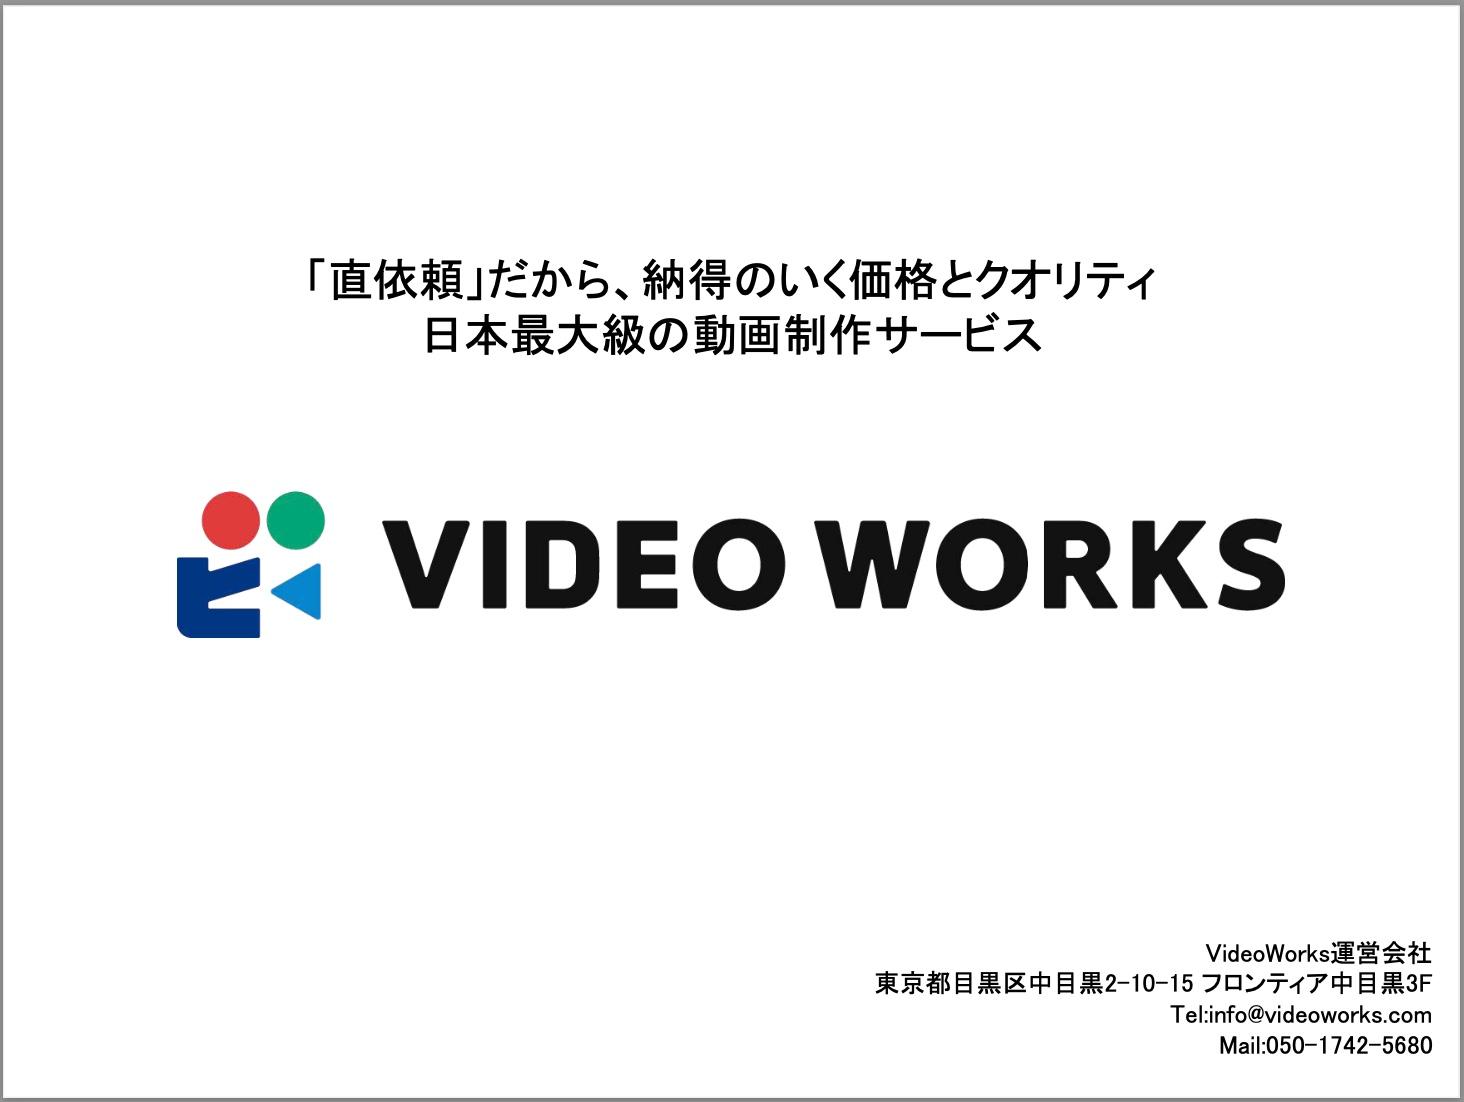 VideoWorksサービス概要資料